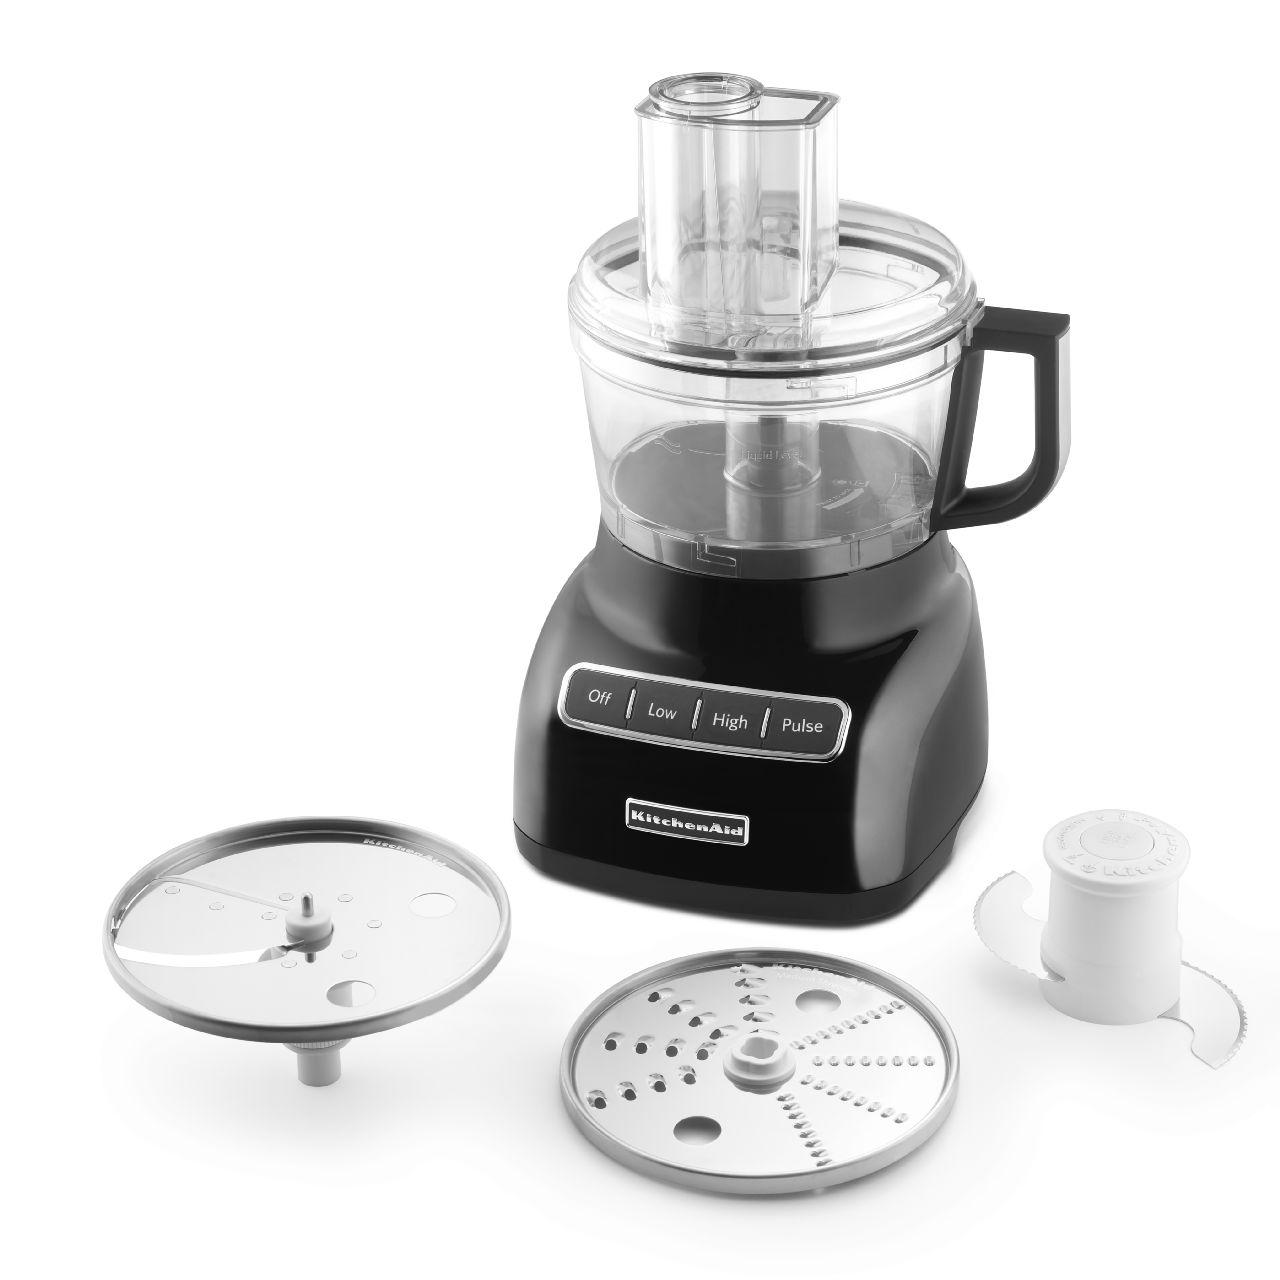 KitchenAid-7-Cup-Food-Processor thumbnail 8